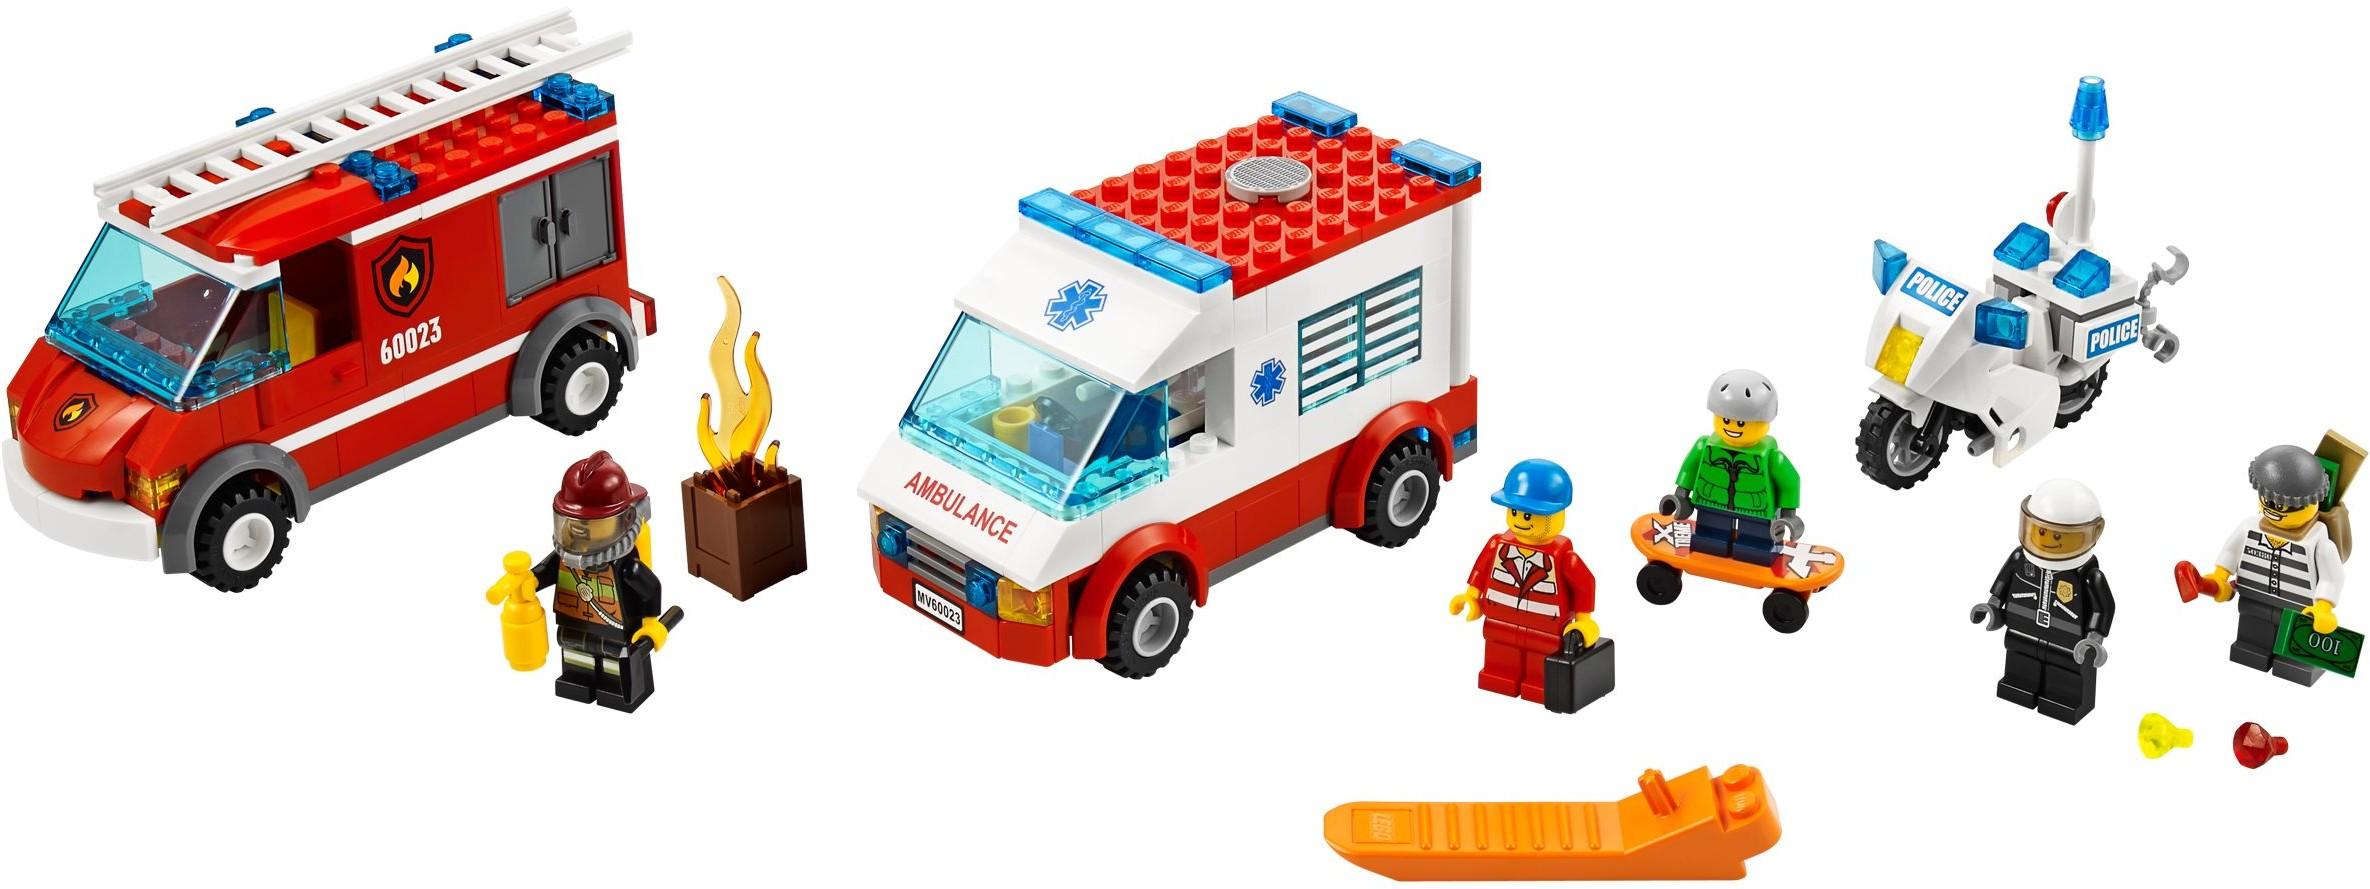 City Tagged Motorcycle Brickset Lego Set Guide And Database